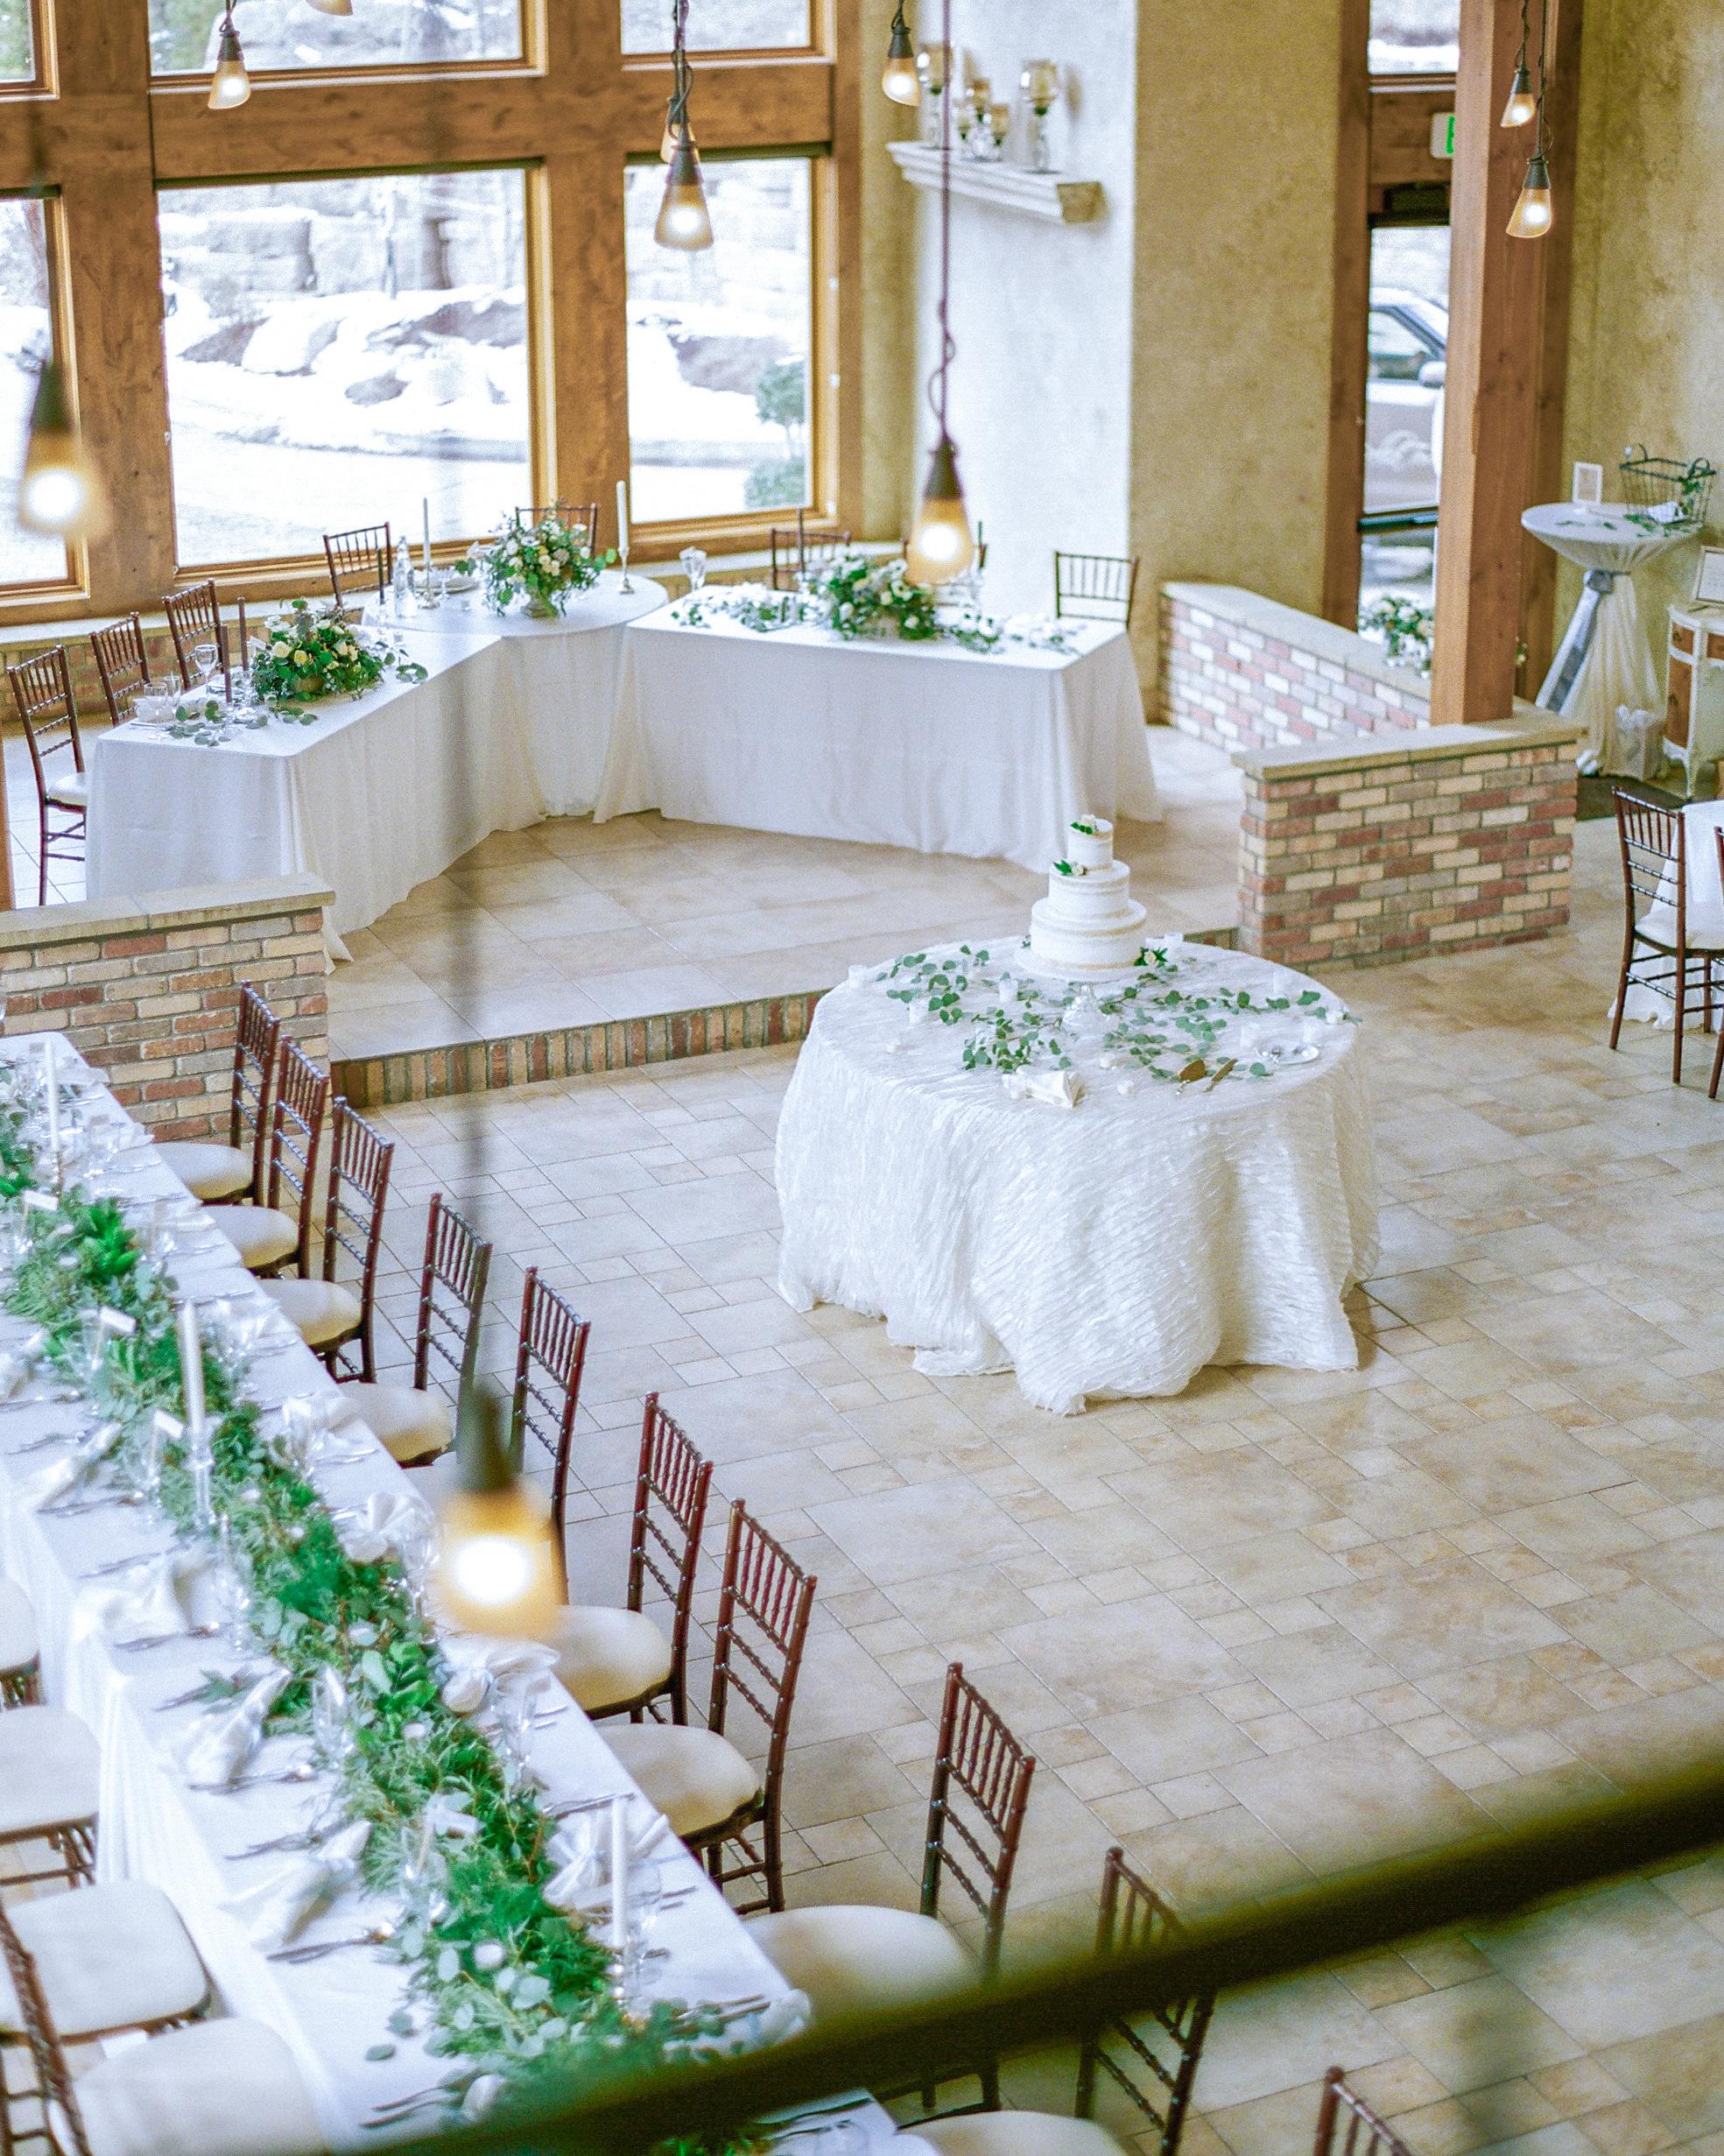 kendall-grant-wedding-reception-039-s112328-1215.jpg